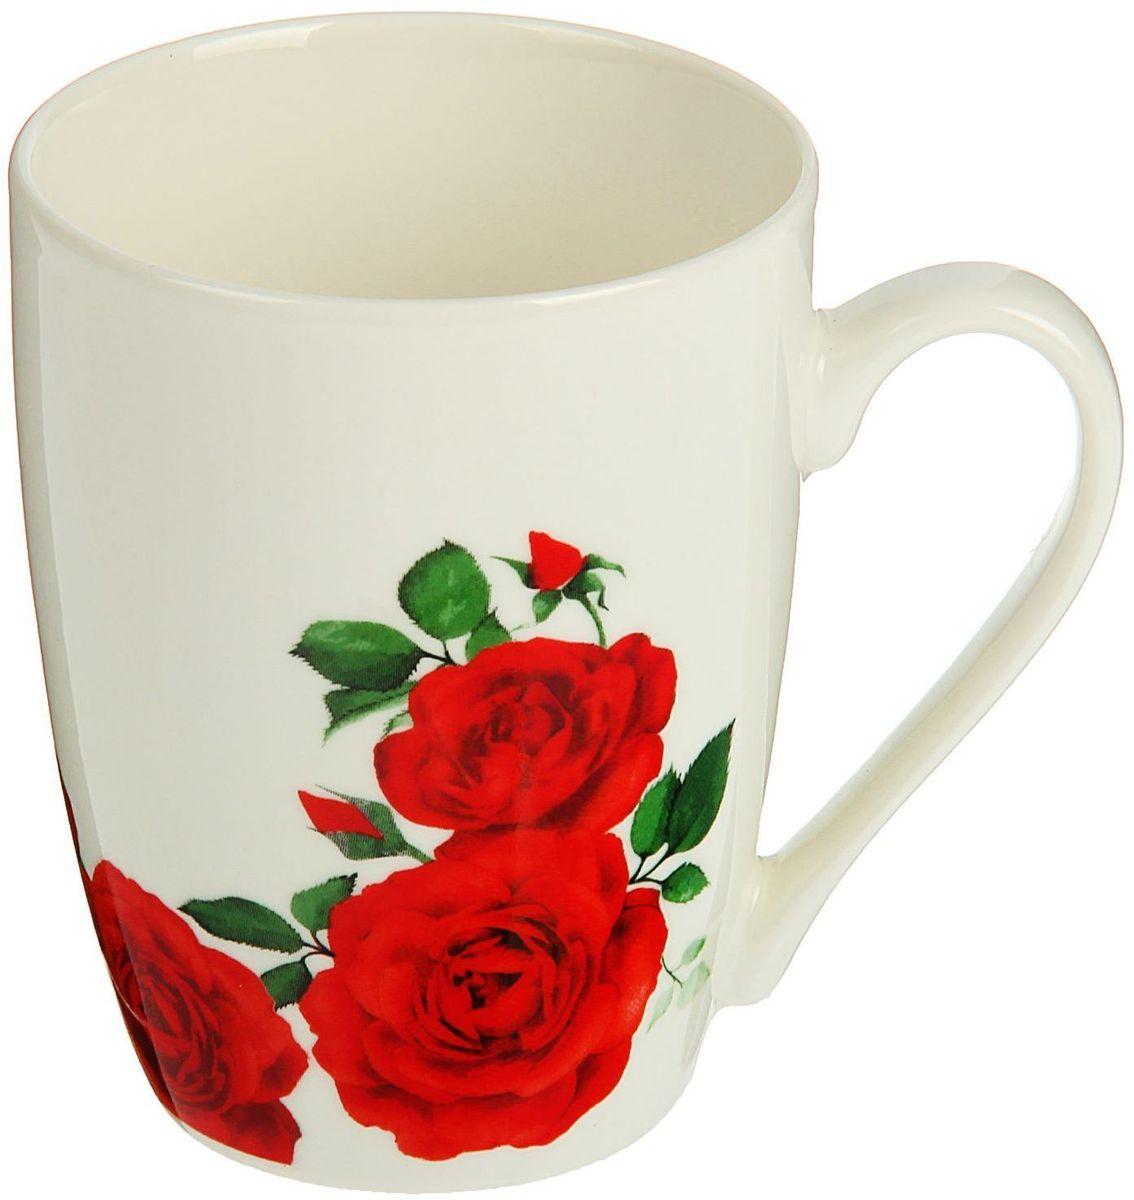 Кружка Доляна Розы, 350 мл кружка доляна смайлы 350 мл